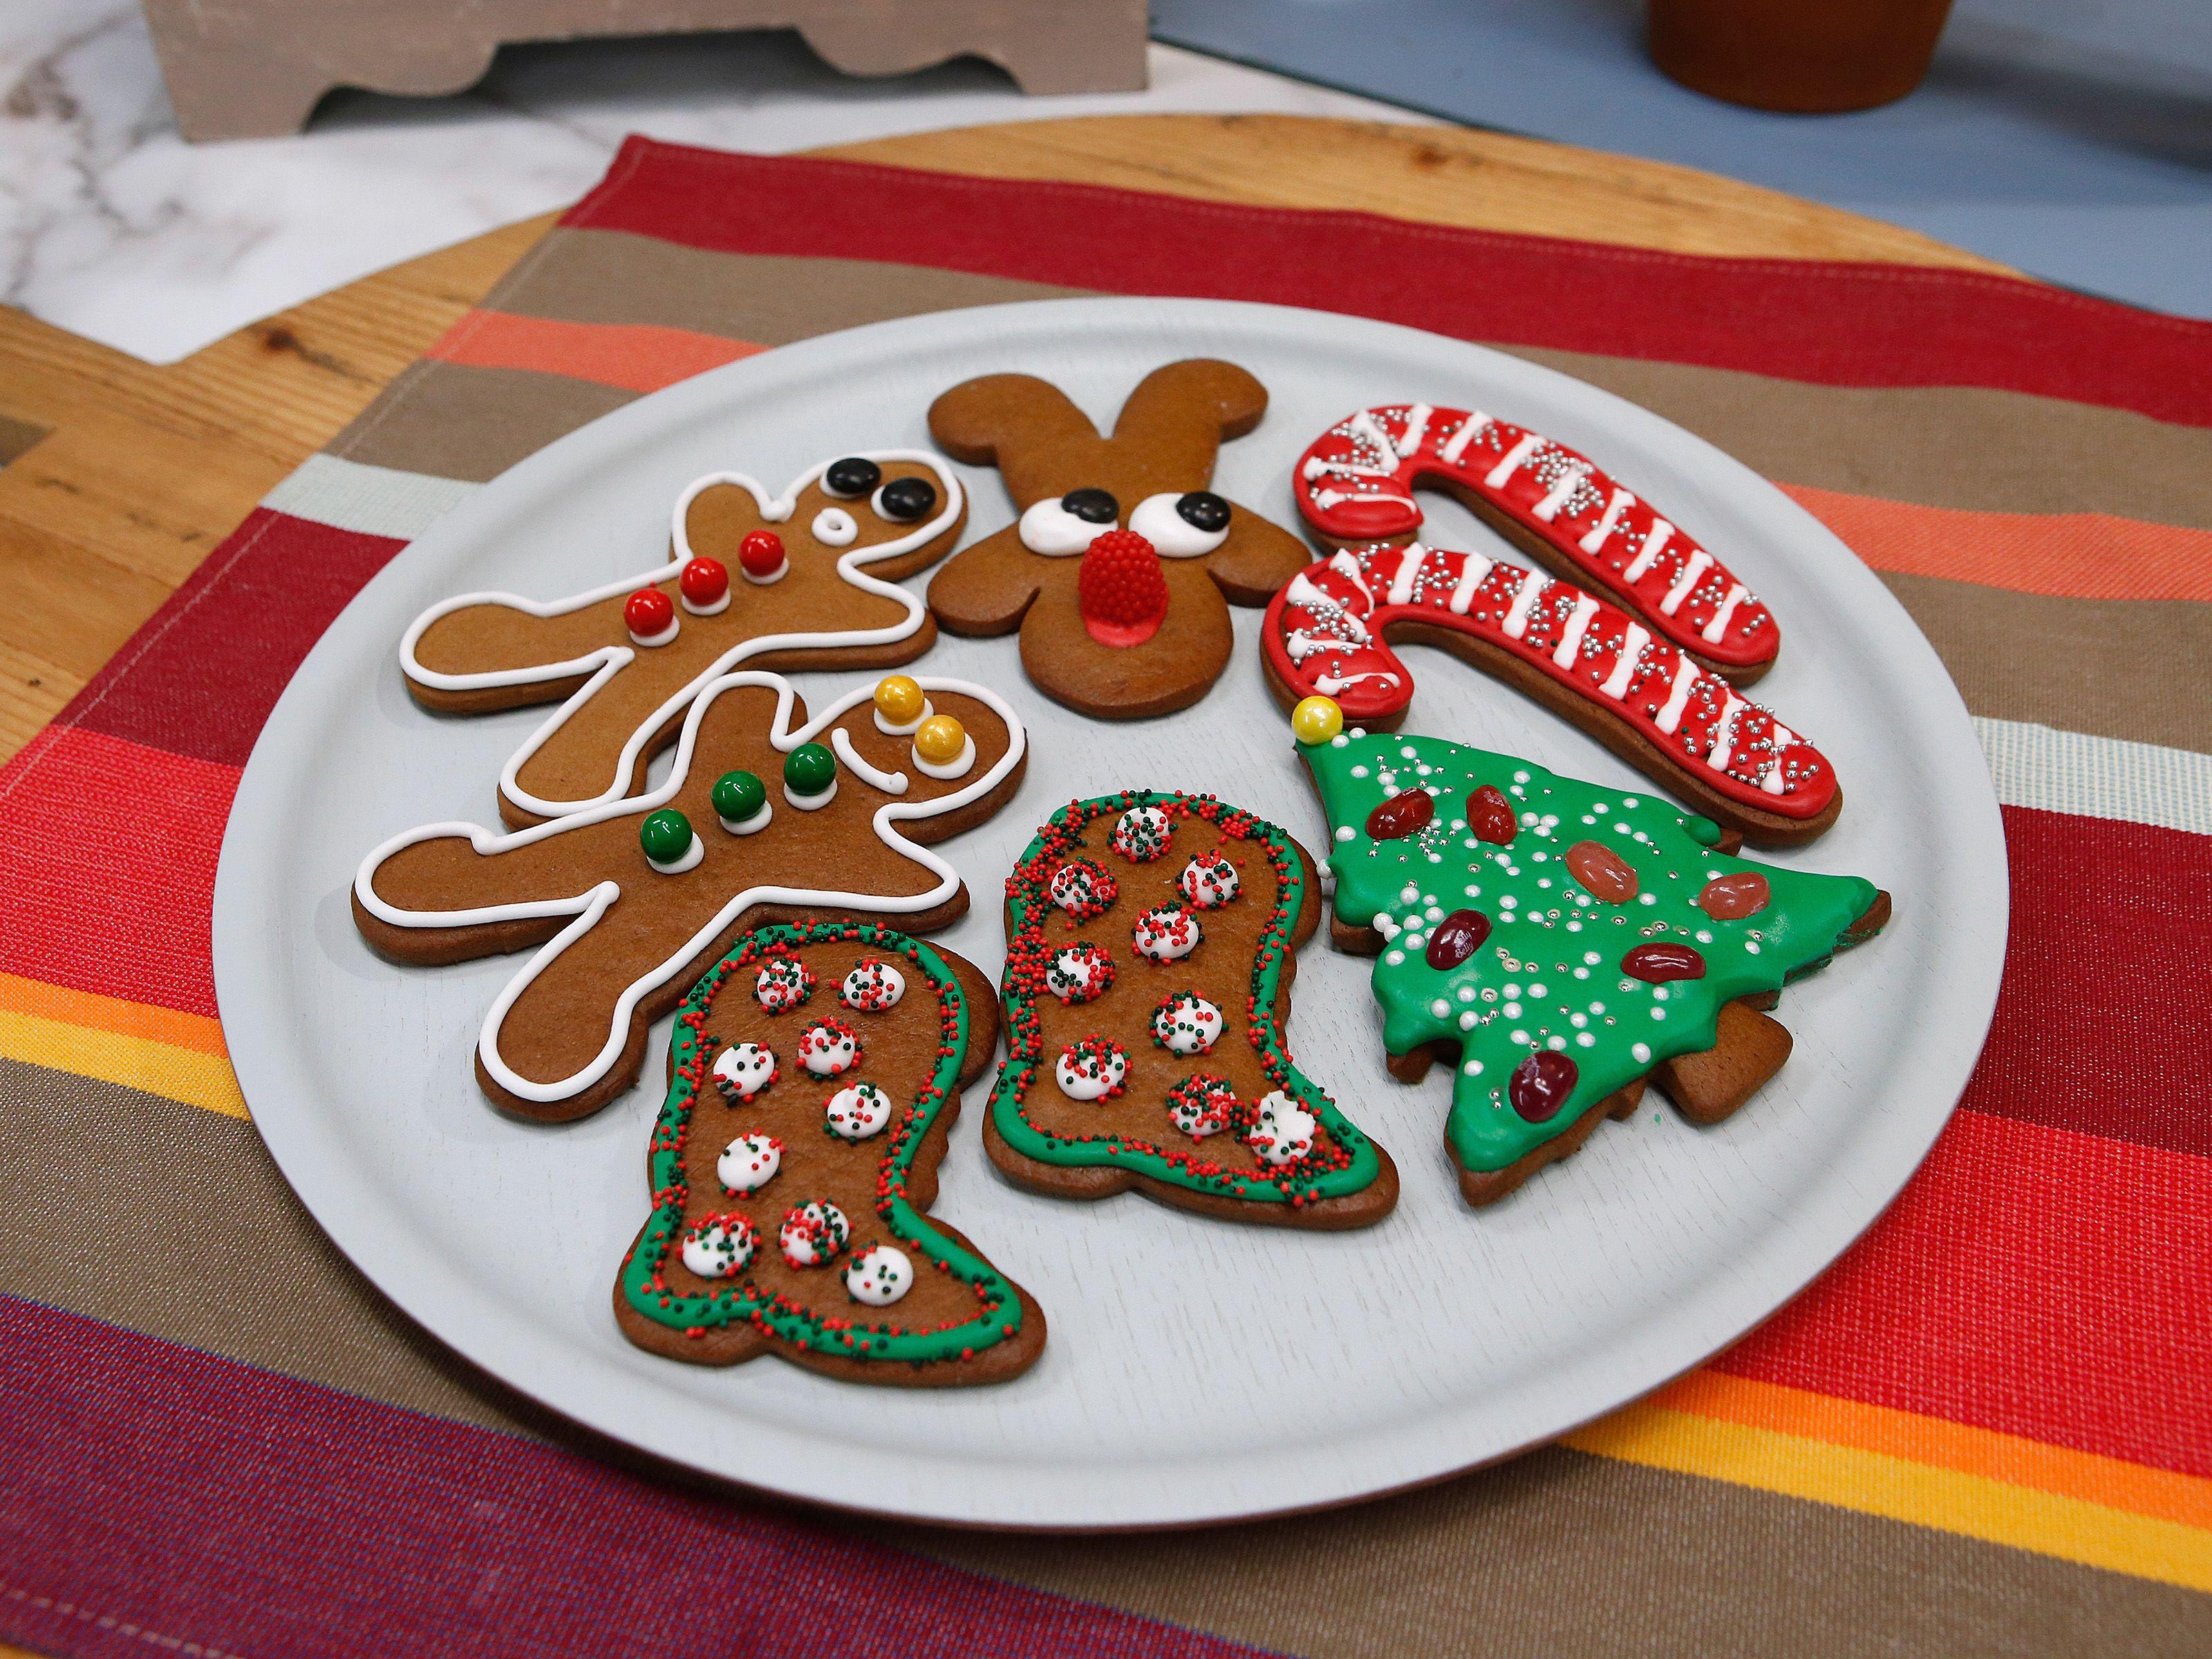 Trisha Yearwood Christmas Cookies  Gingerbread Cookies recipe from Duff Goldman via Food